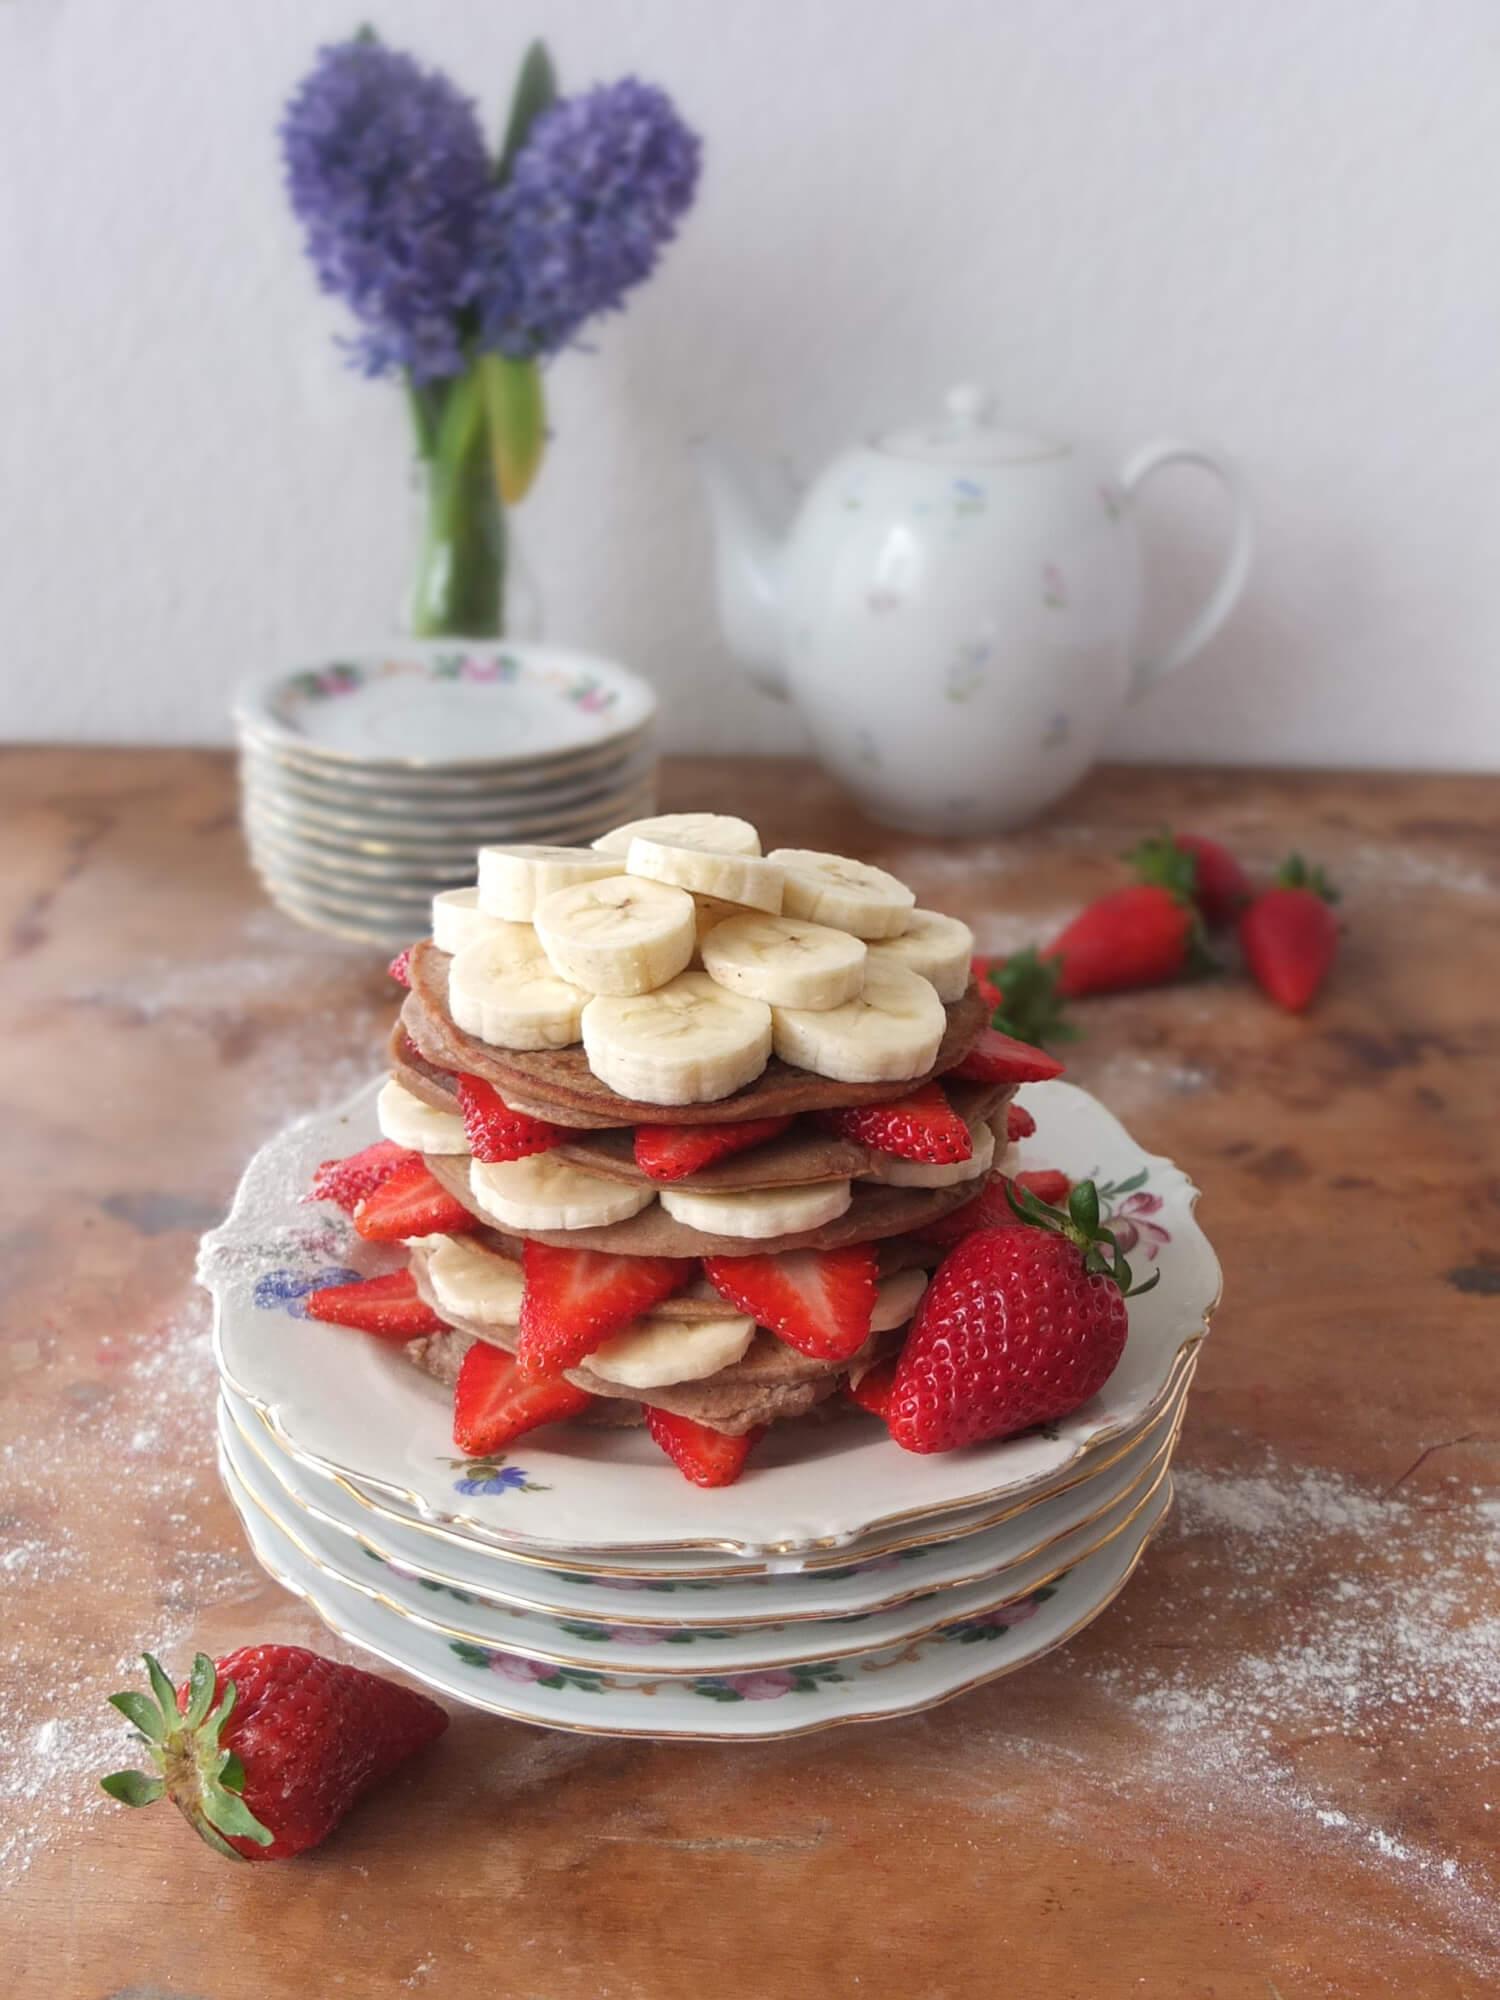 Vegane Buchweizen-Bananen-Pancakes - La Crema Patisserie Foodblog Backblog